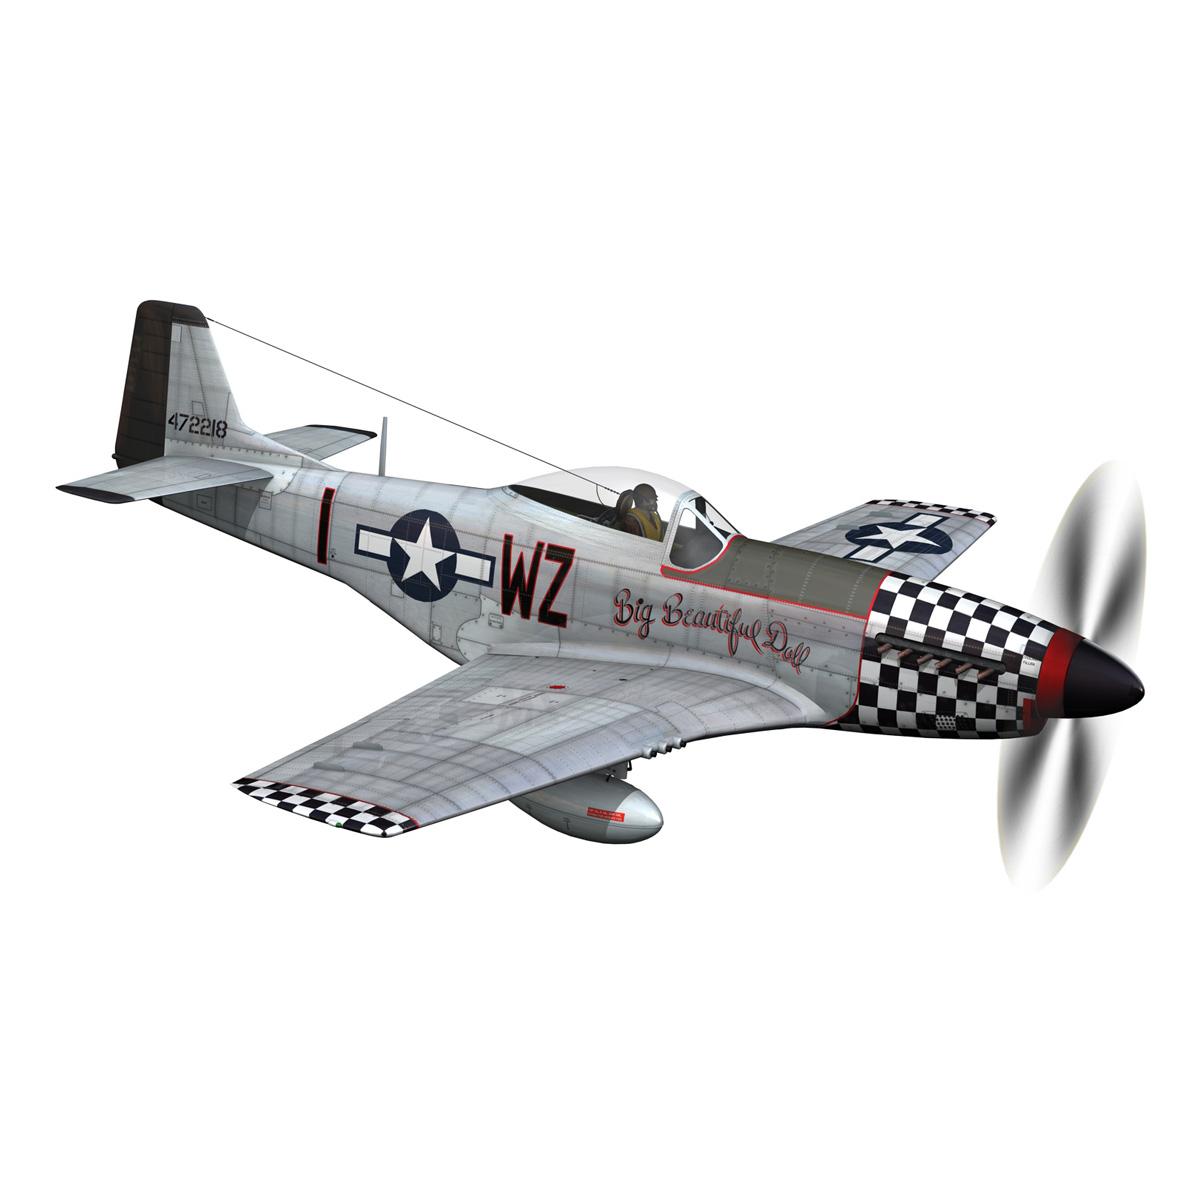 north american p-51d mustang – big beautiful doll 3d model fbx c4d lwo obj 282556